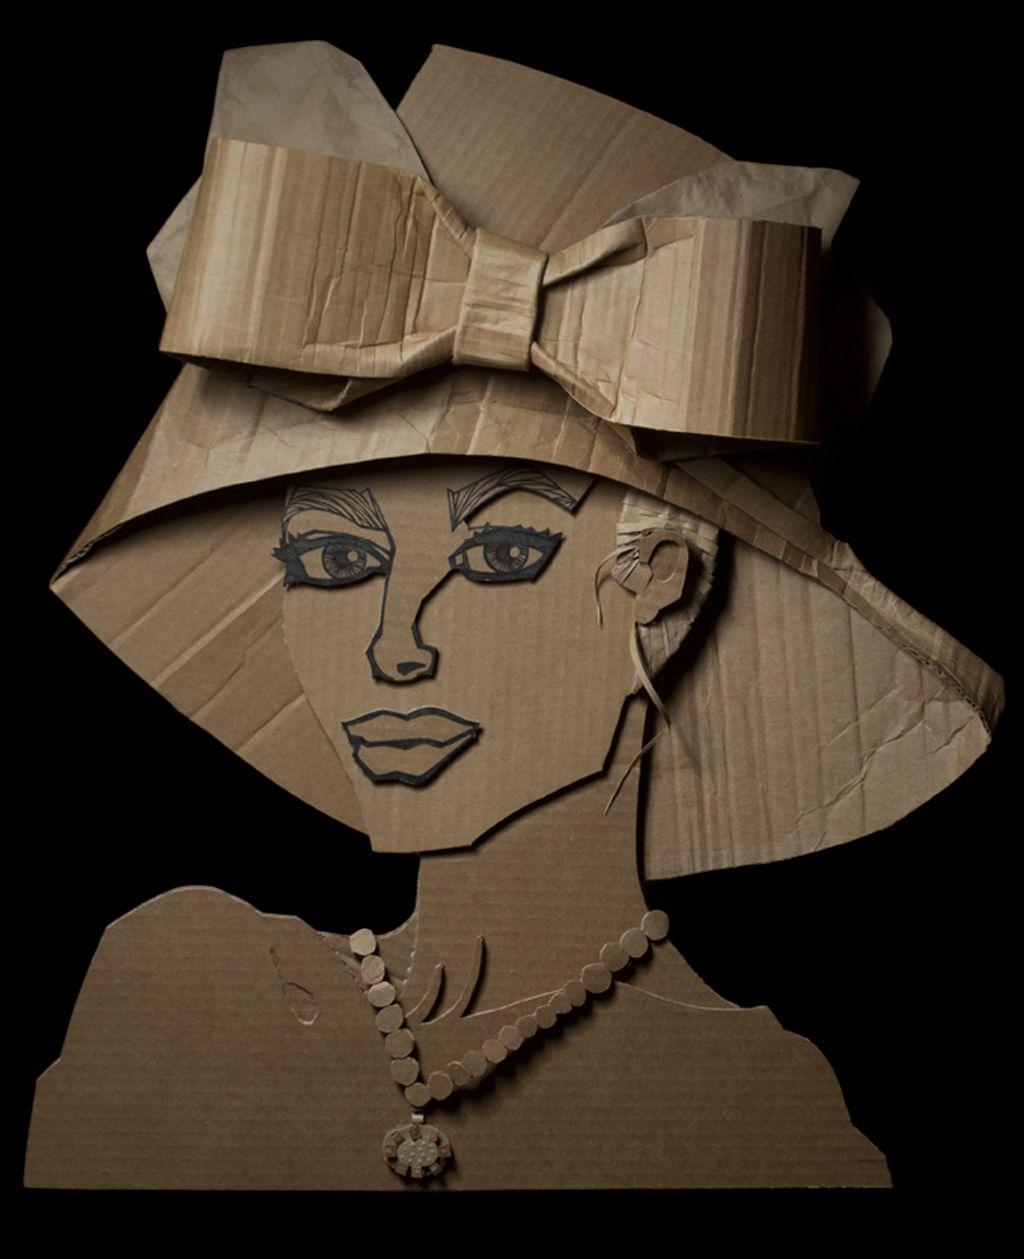 Recycled Art Project by Ali Golzad #recycledart